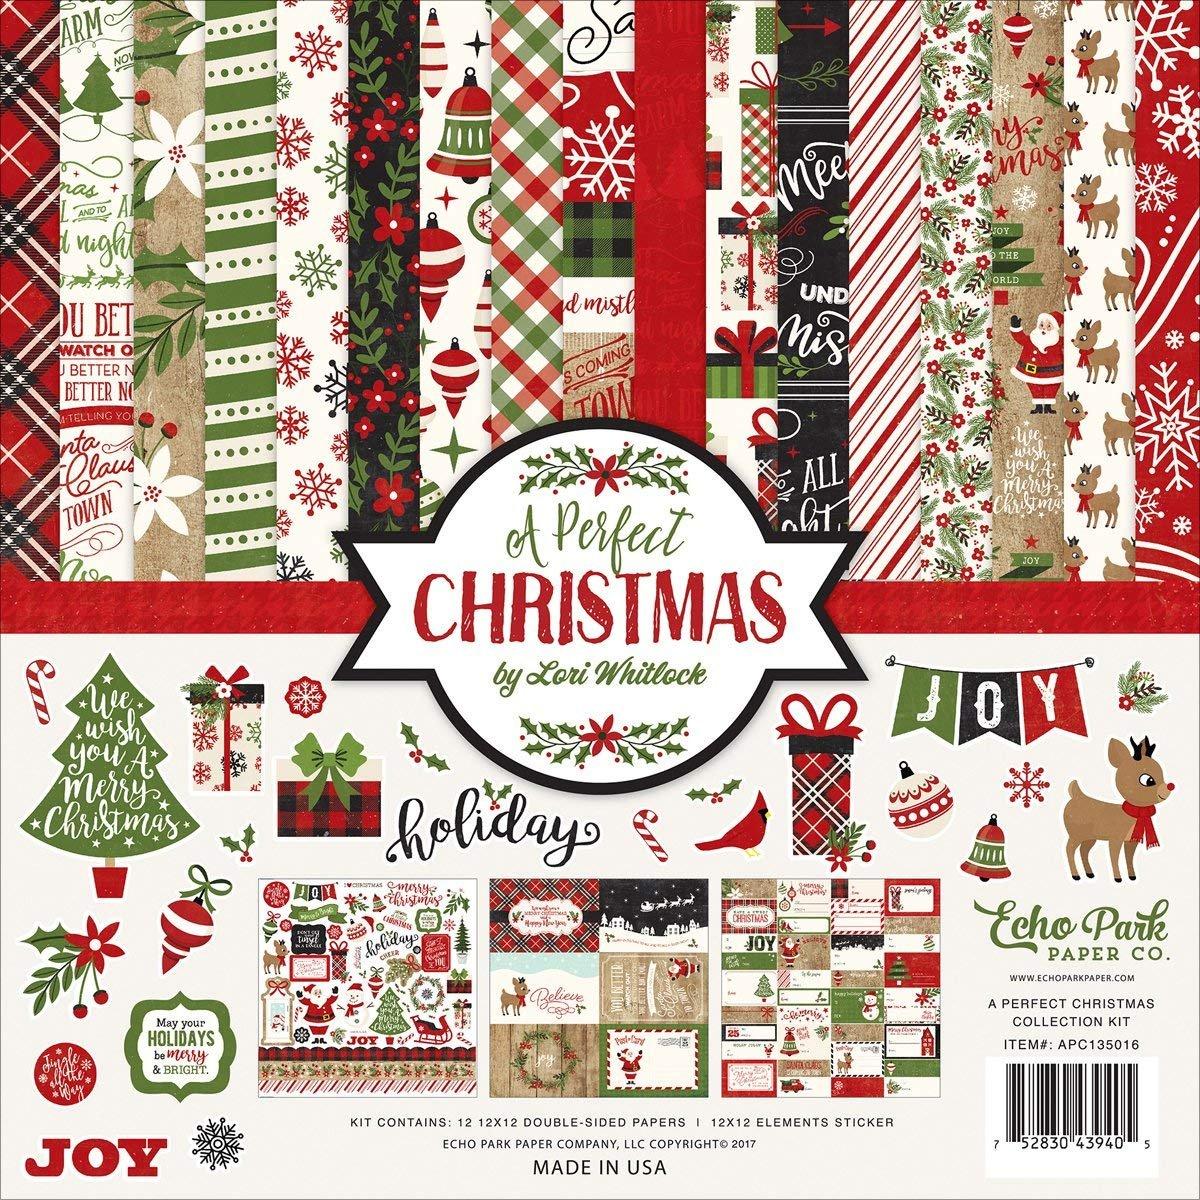 A Perfect Christmas Collection Kit